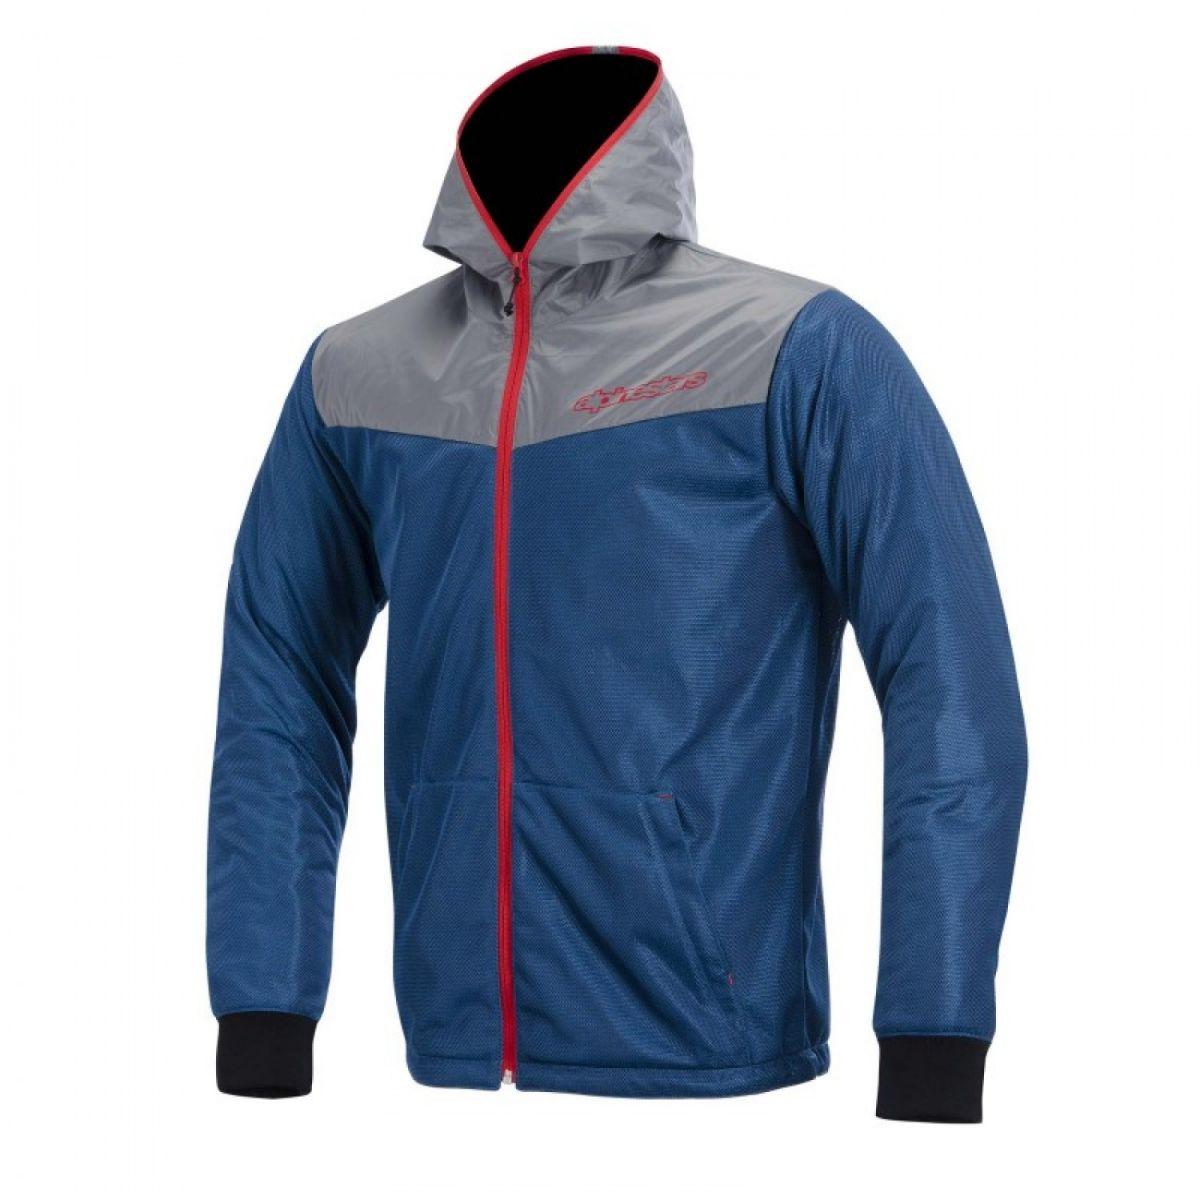 Jaqueta Alpinestars Runner Air Azul/Vermelha  - Nova Suzuki Motos e Acessórios